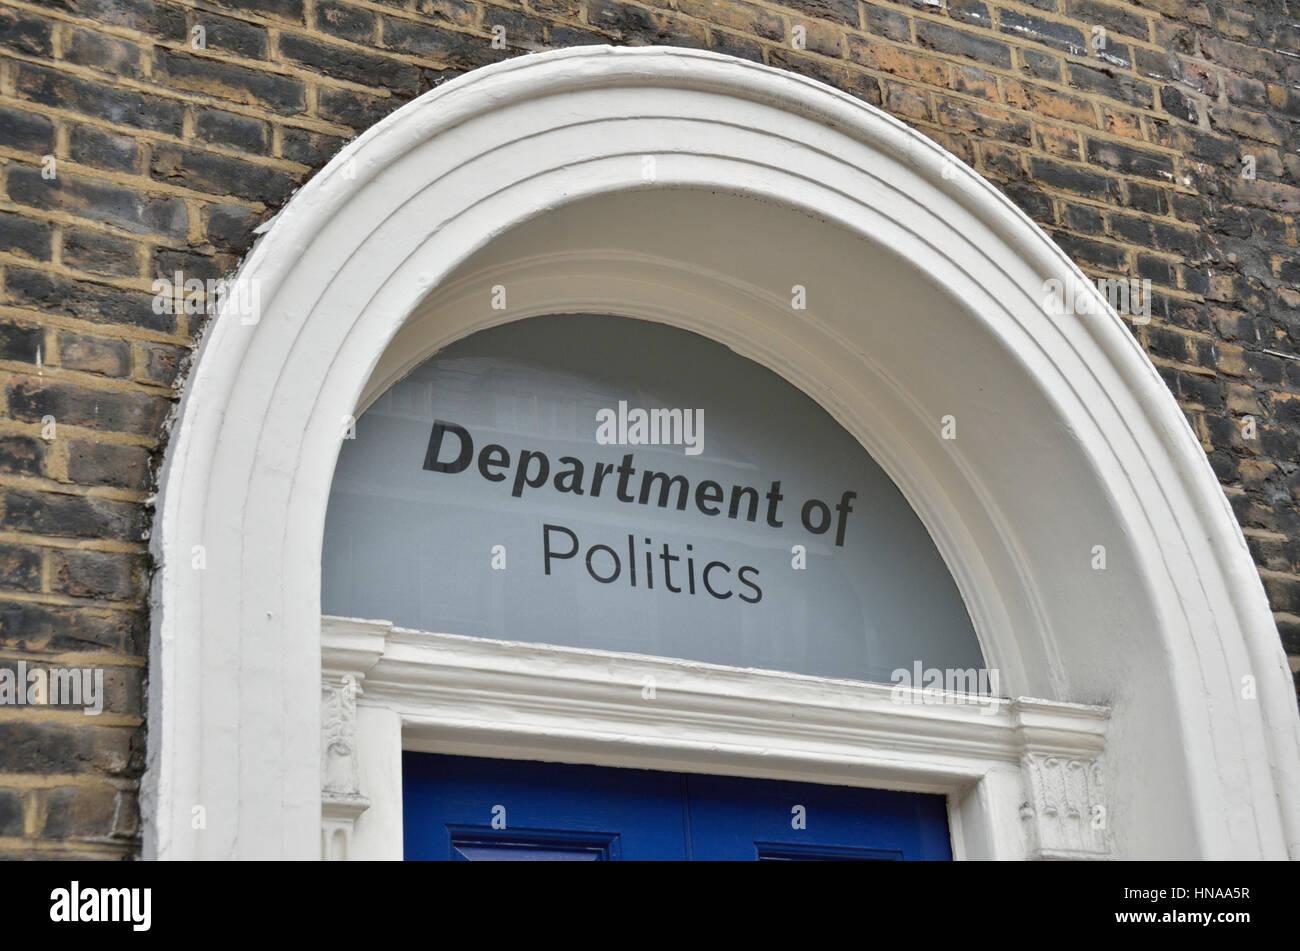 University department of politics sign above a doorway - Stock Image